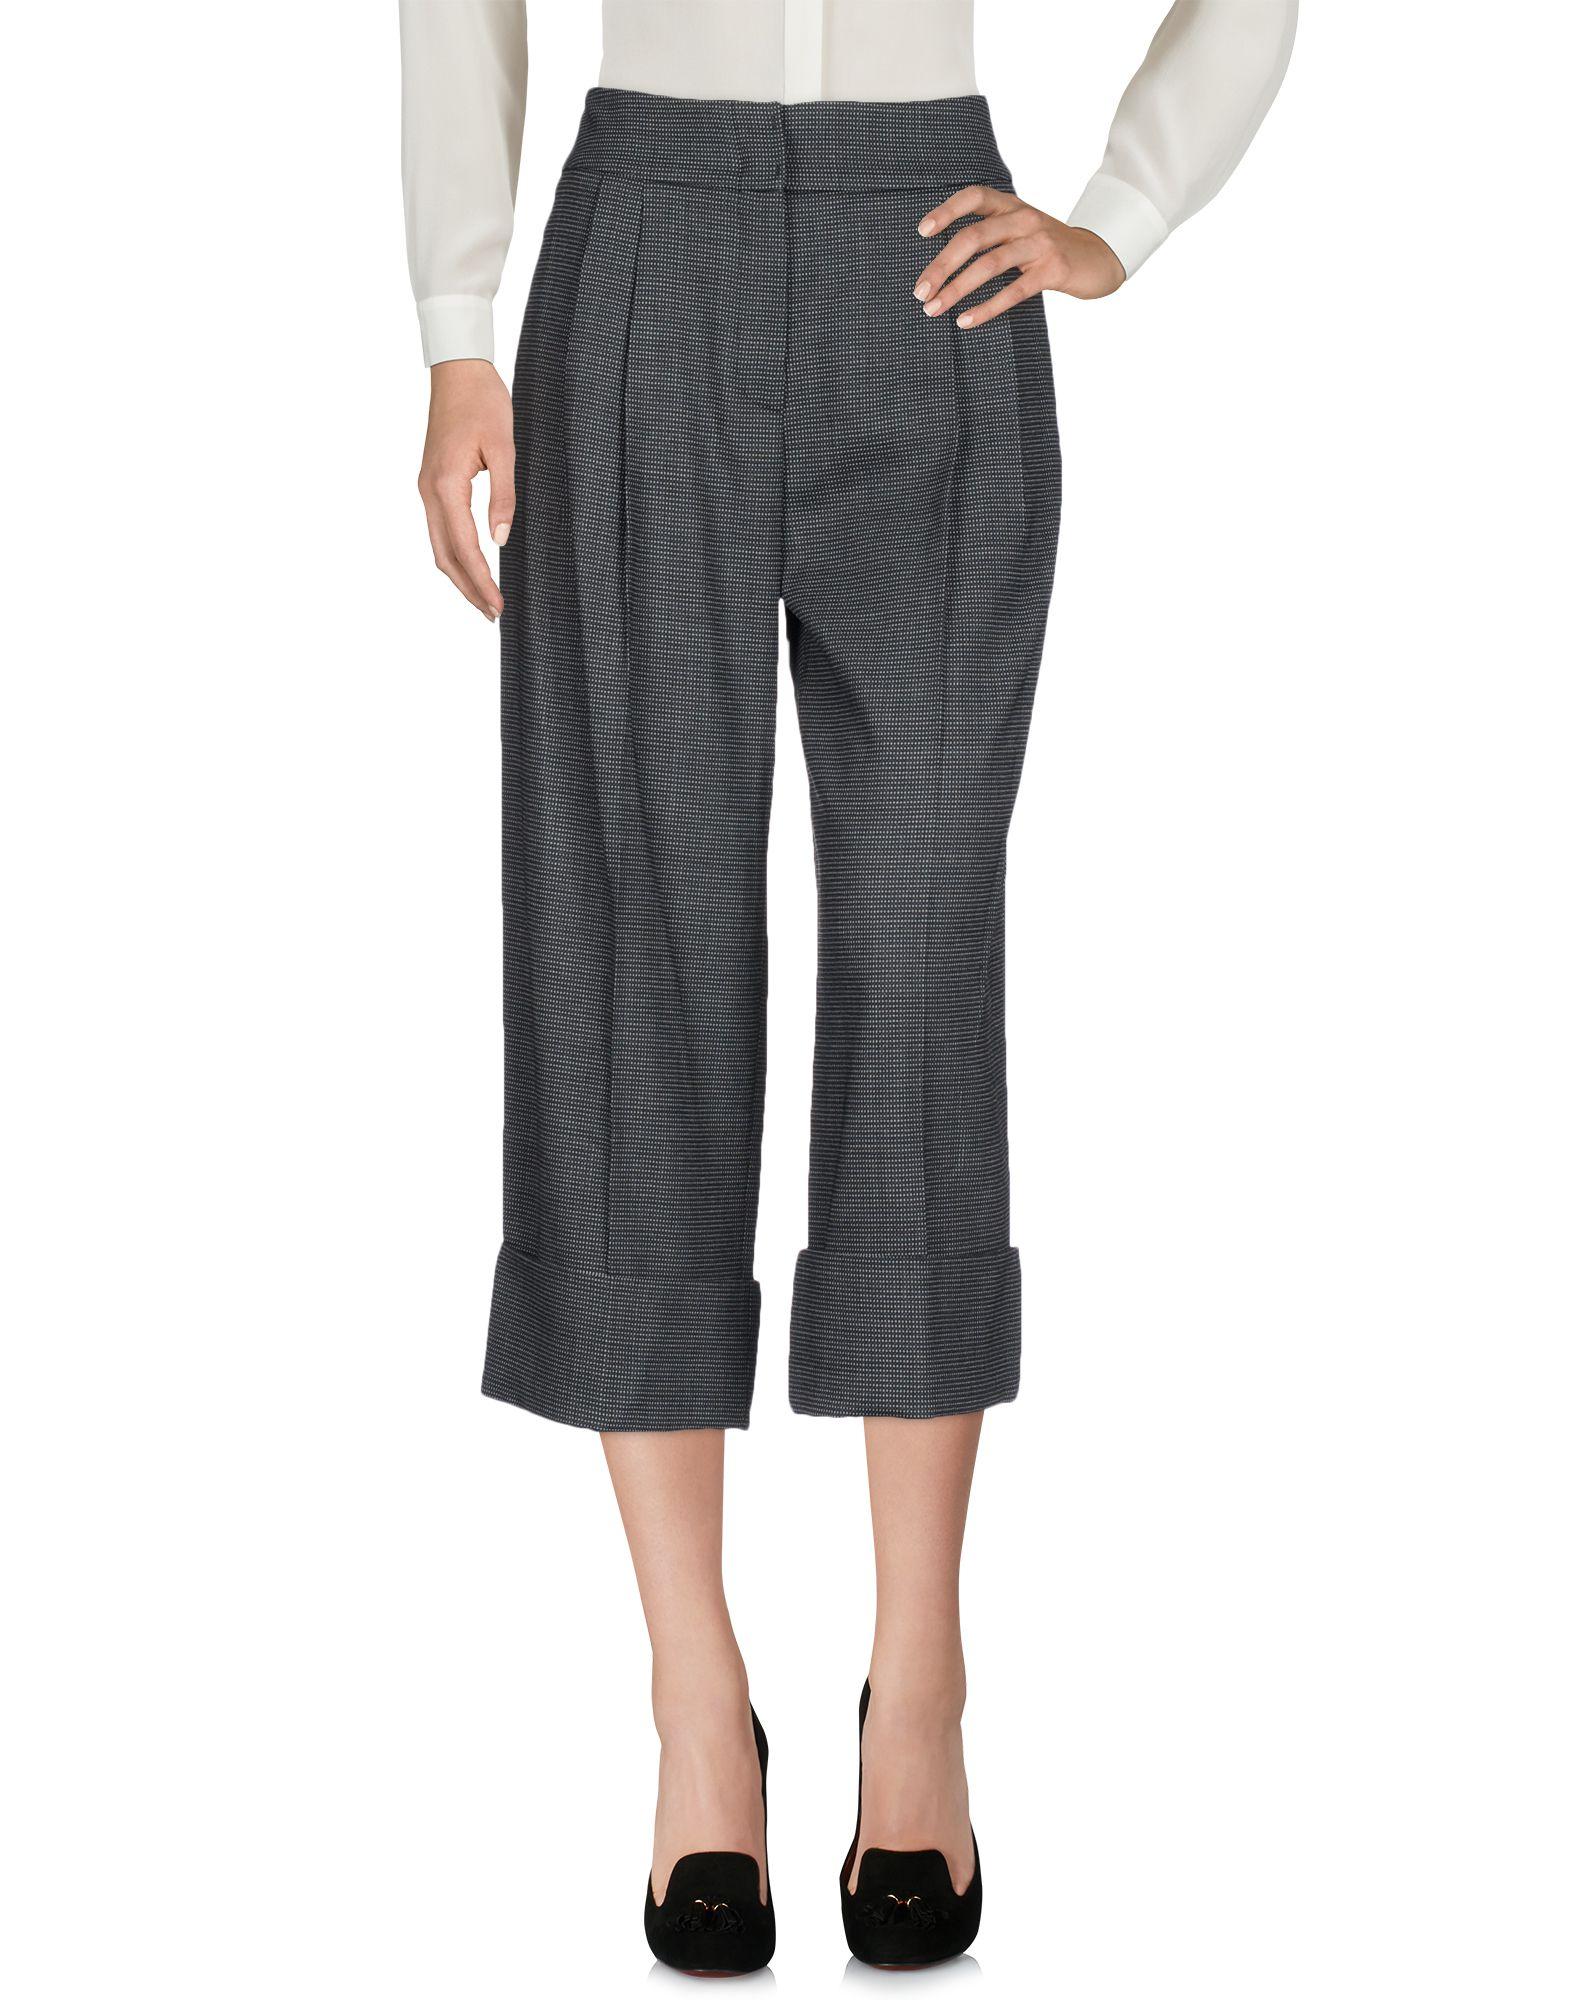 Pantalone Classico Antonio Marras Donna - Acquista online su xUEfOKgz